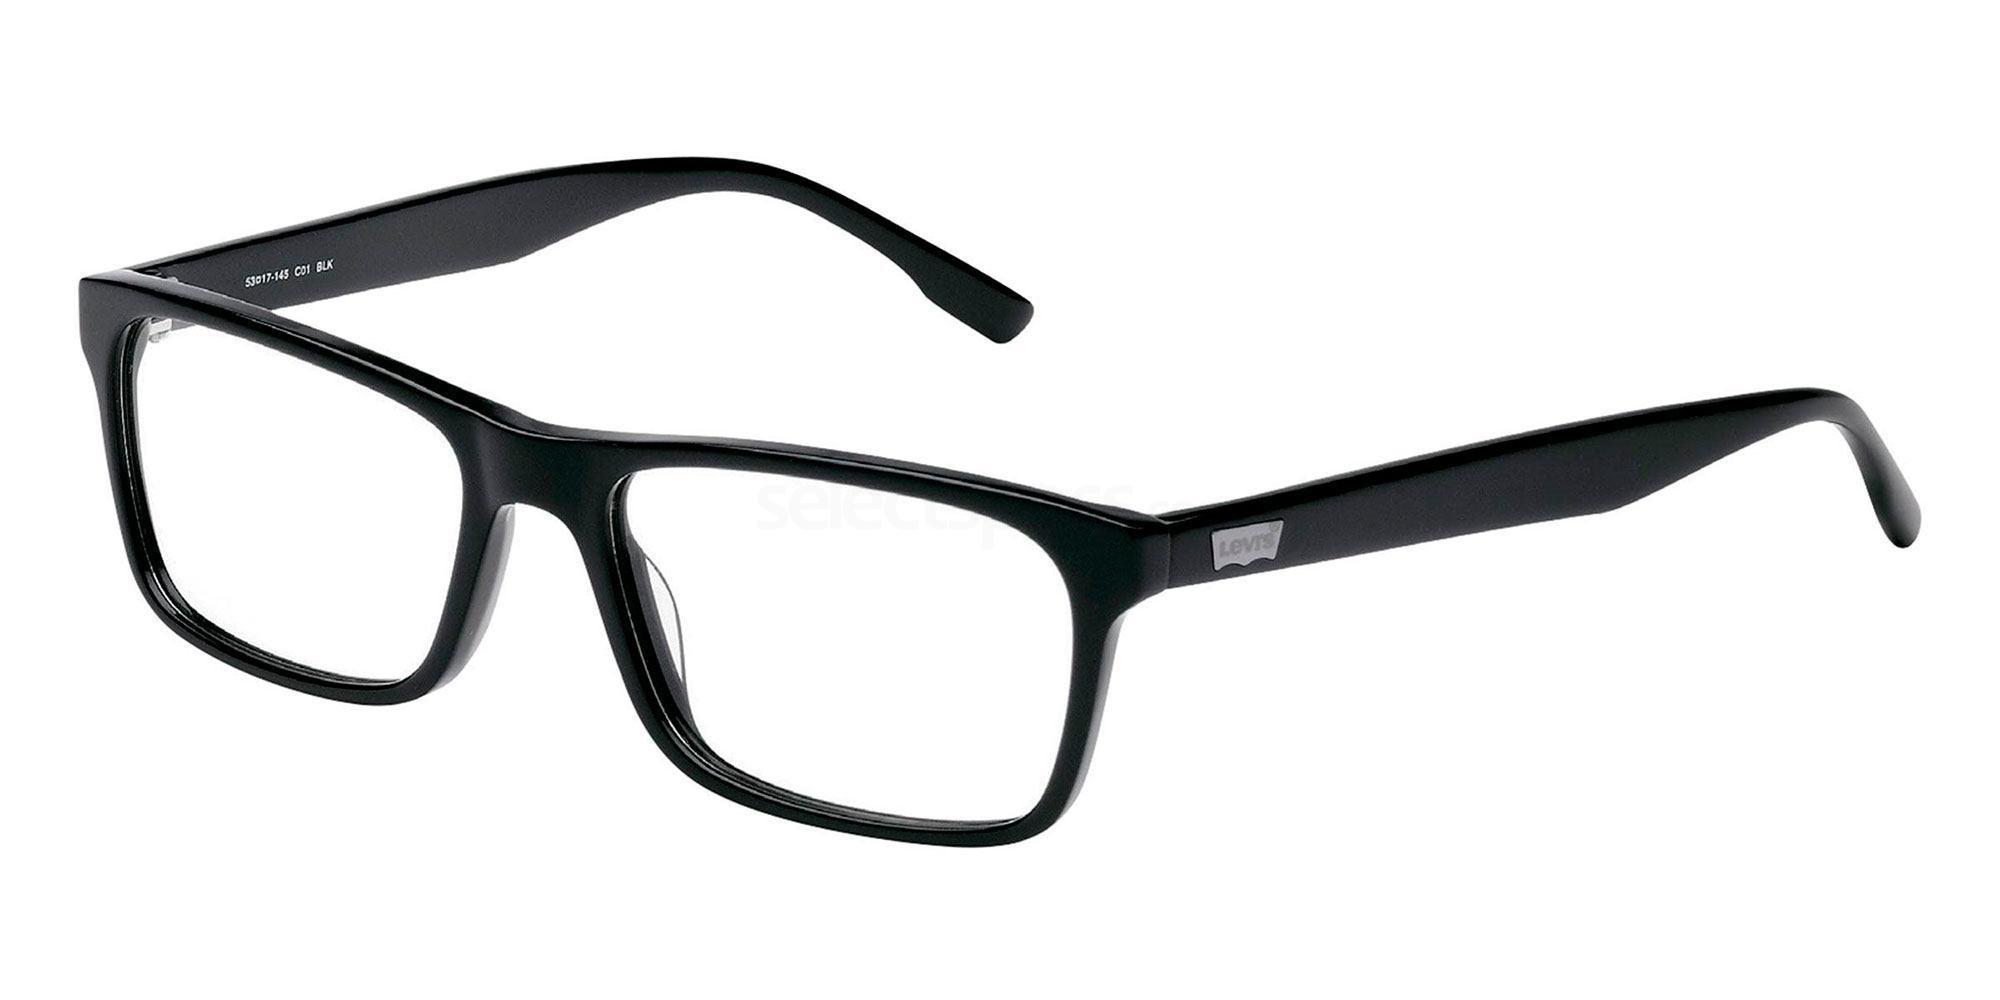 01 BLK LS119 Glasses, Levi's Eyewear